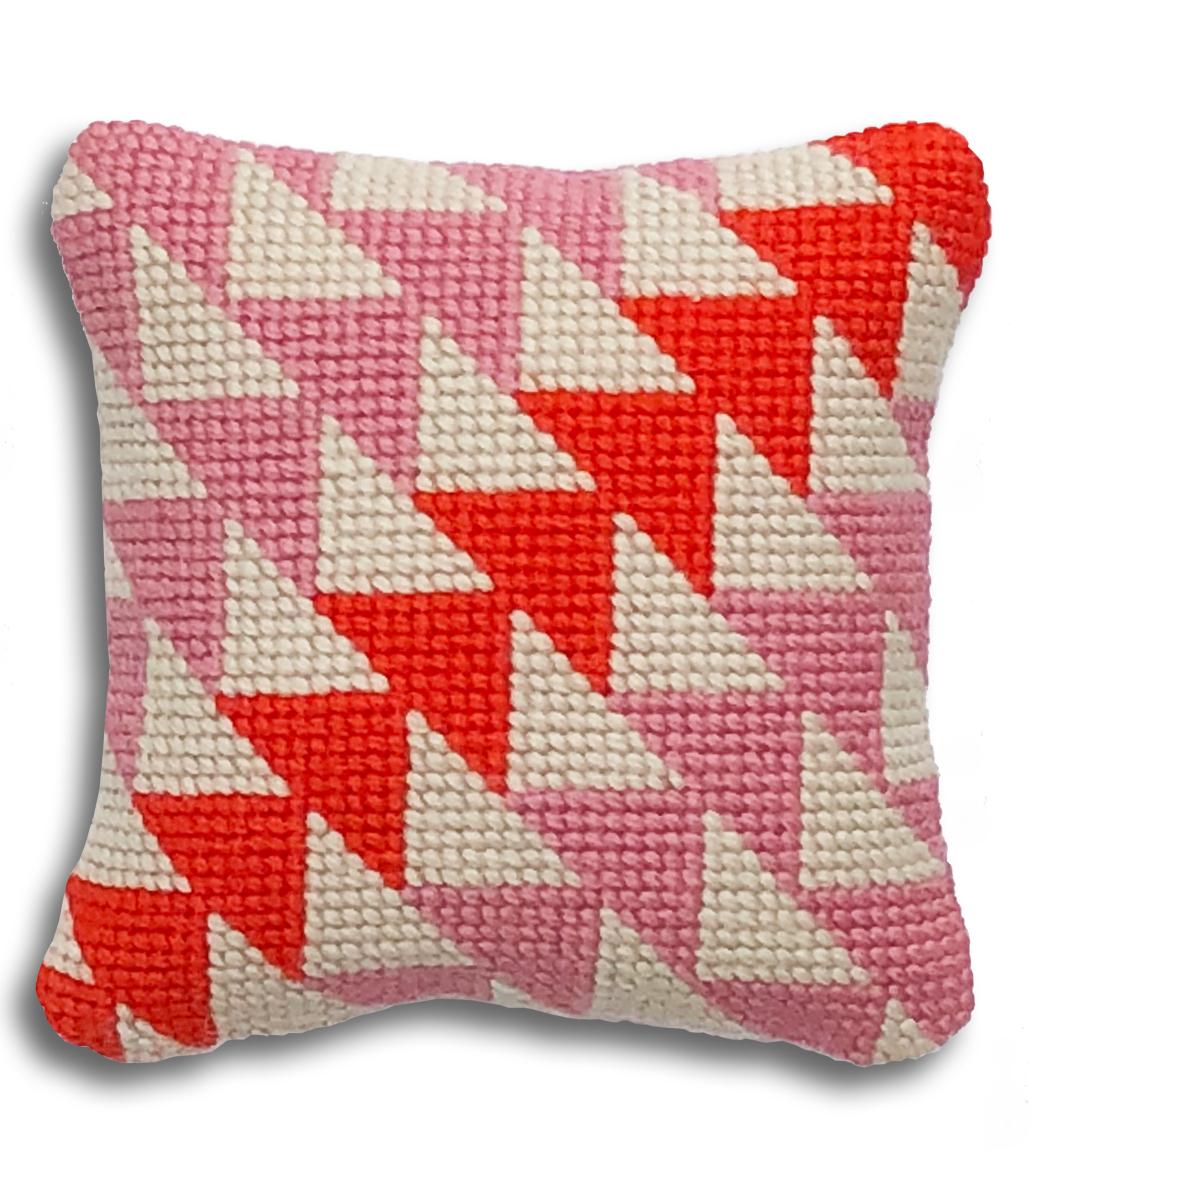 Geometric Triangles mini kit    Pink and orange colourway  £16  (includes free UK postage)